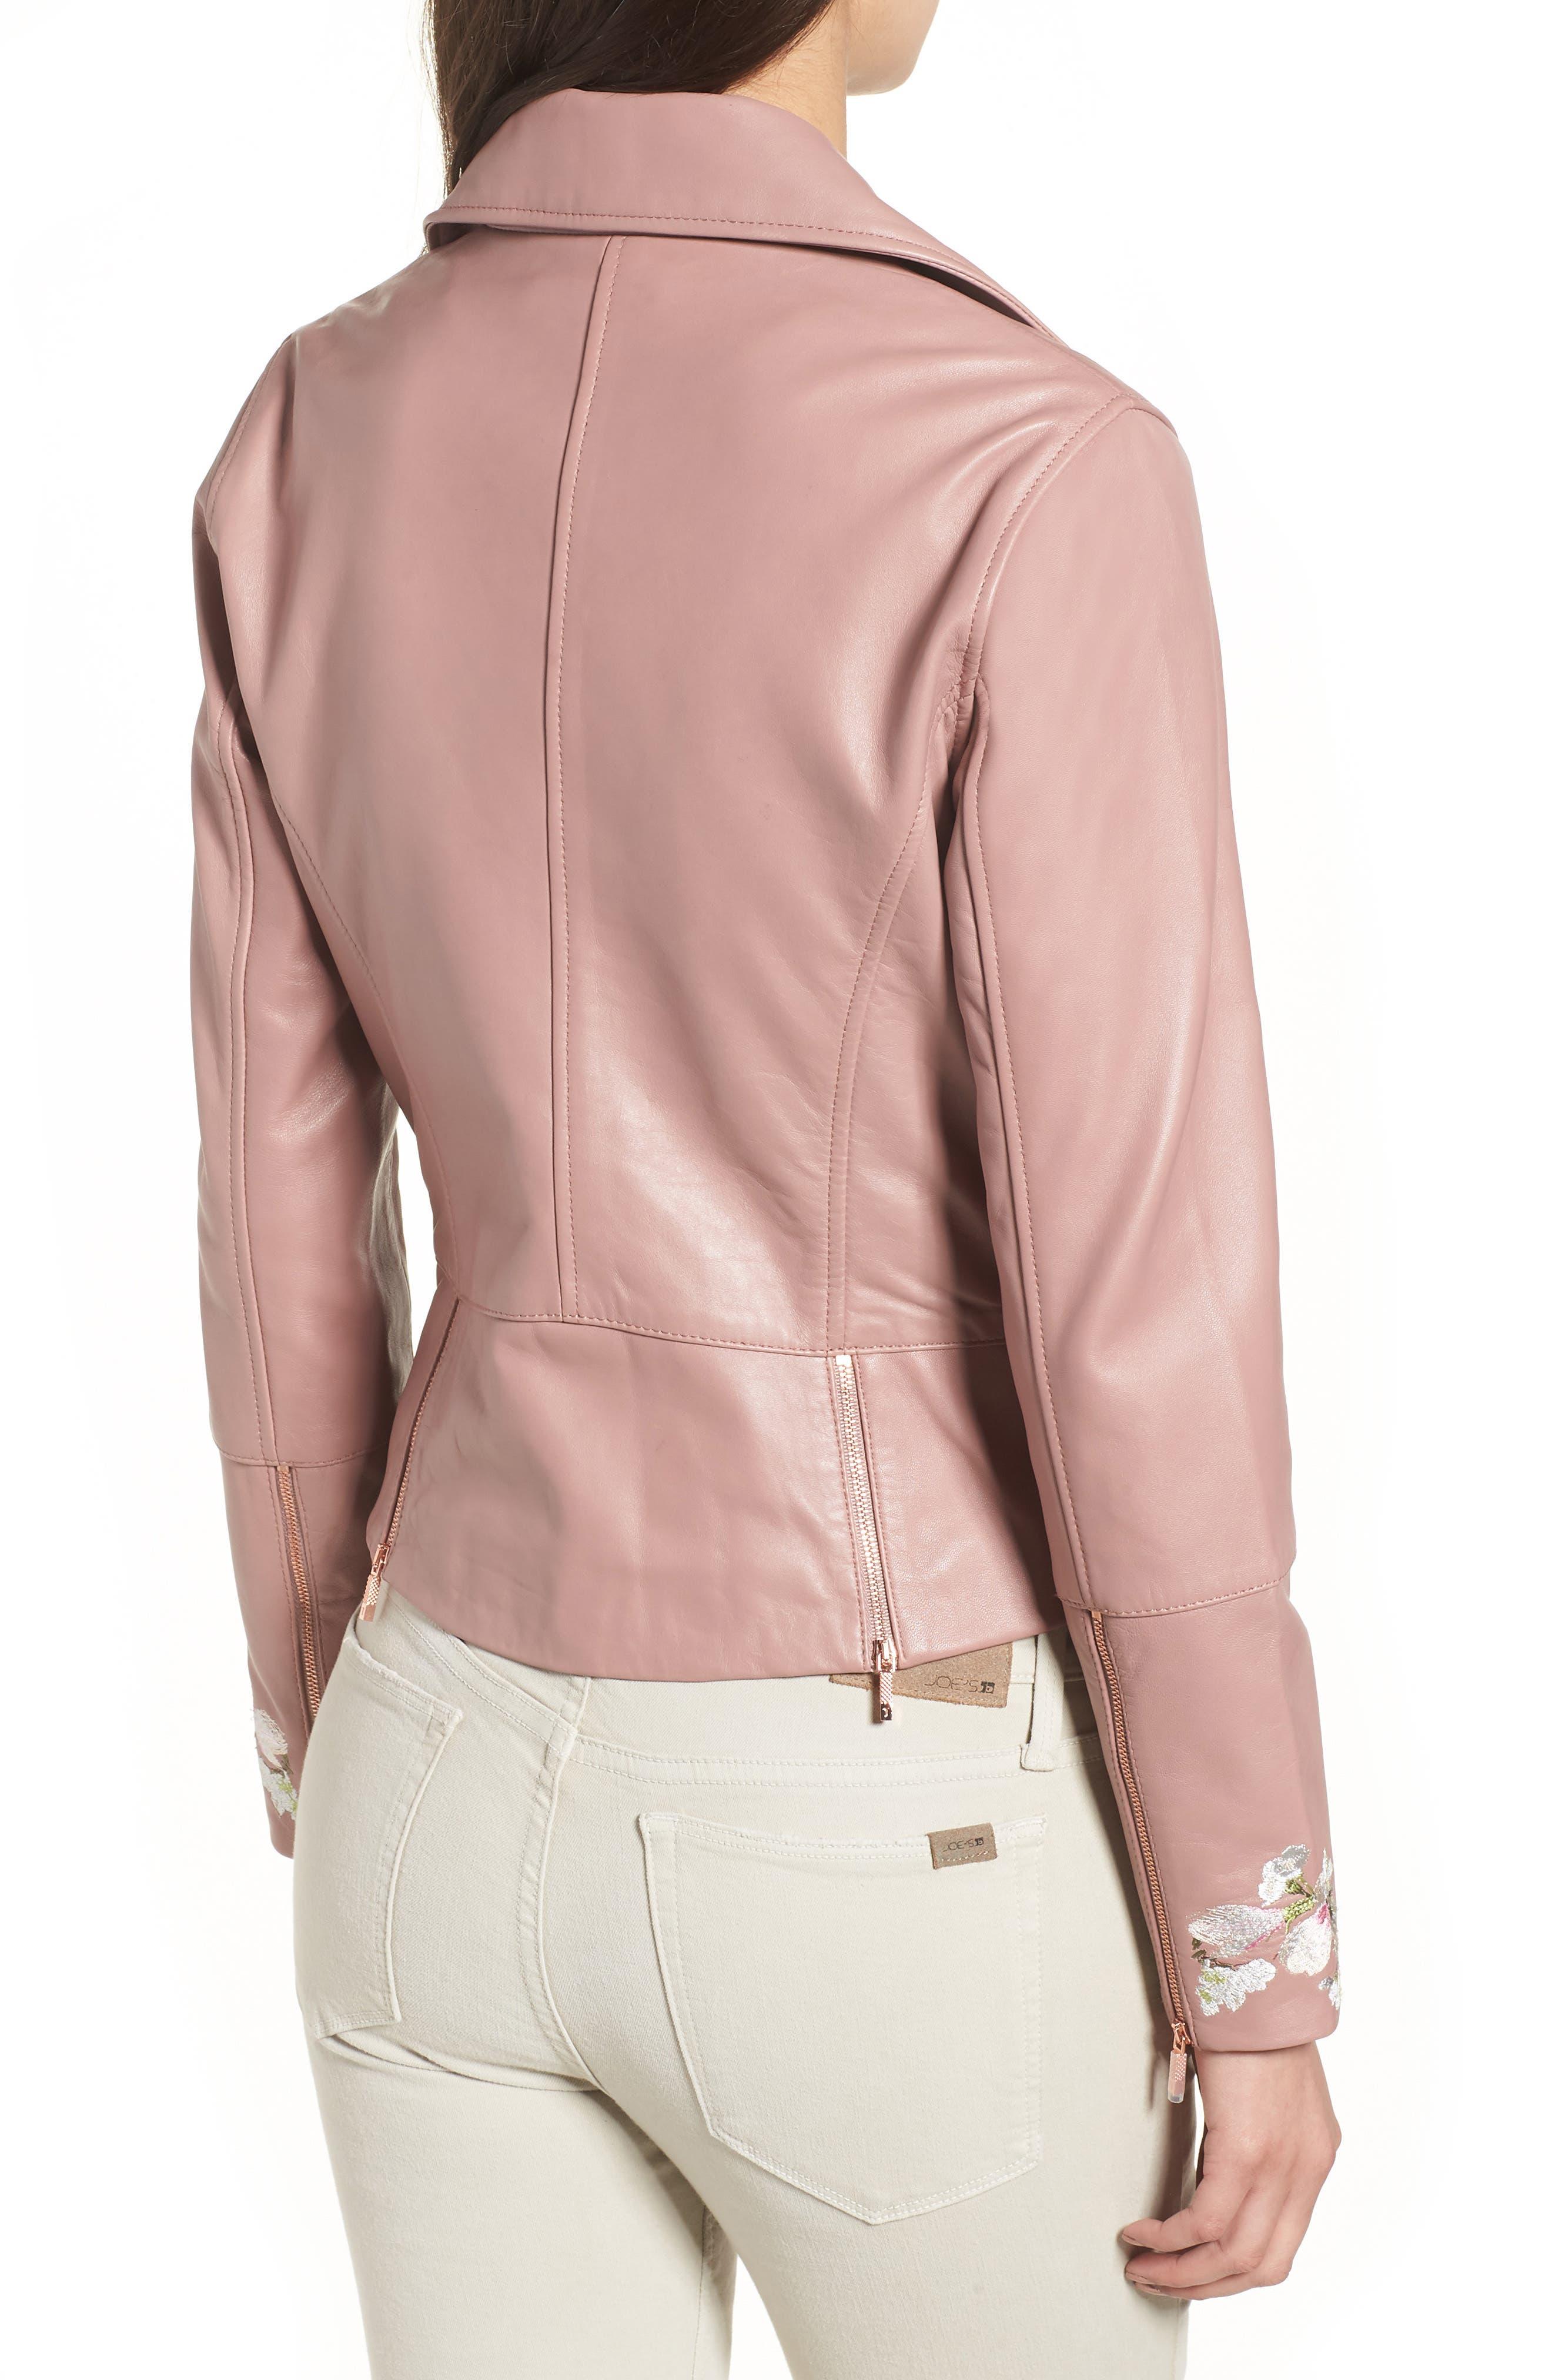 Harmony Embroidered Leather Biker Jacket,                             Alternate thumbnail 2, color,                             Dusky Pink